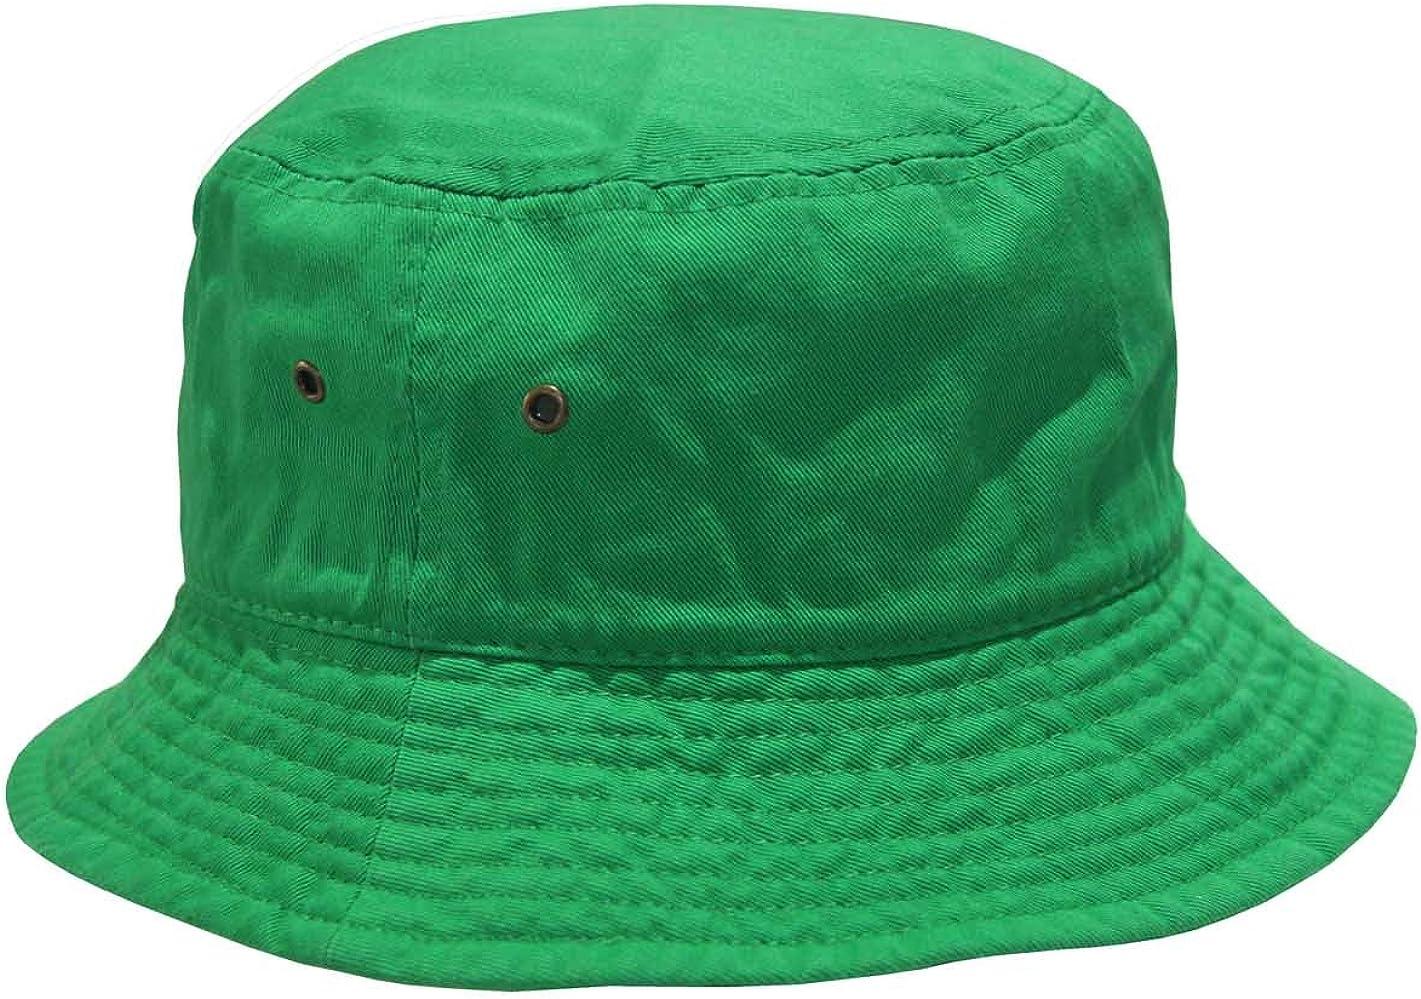 Short 2021 Brim Visor Cotton Free shipping Bucket Large Hat Kelly Sun X-Large